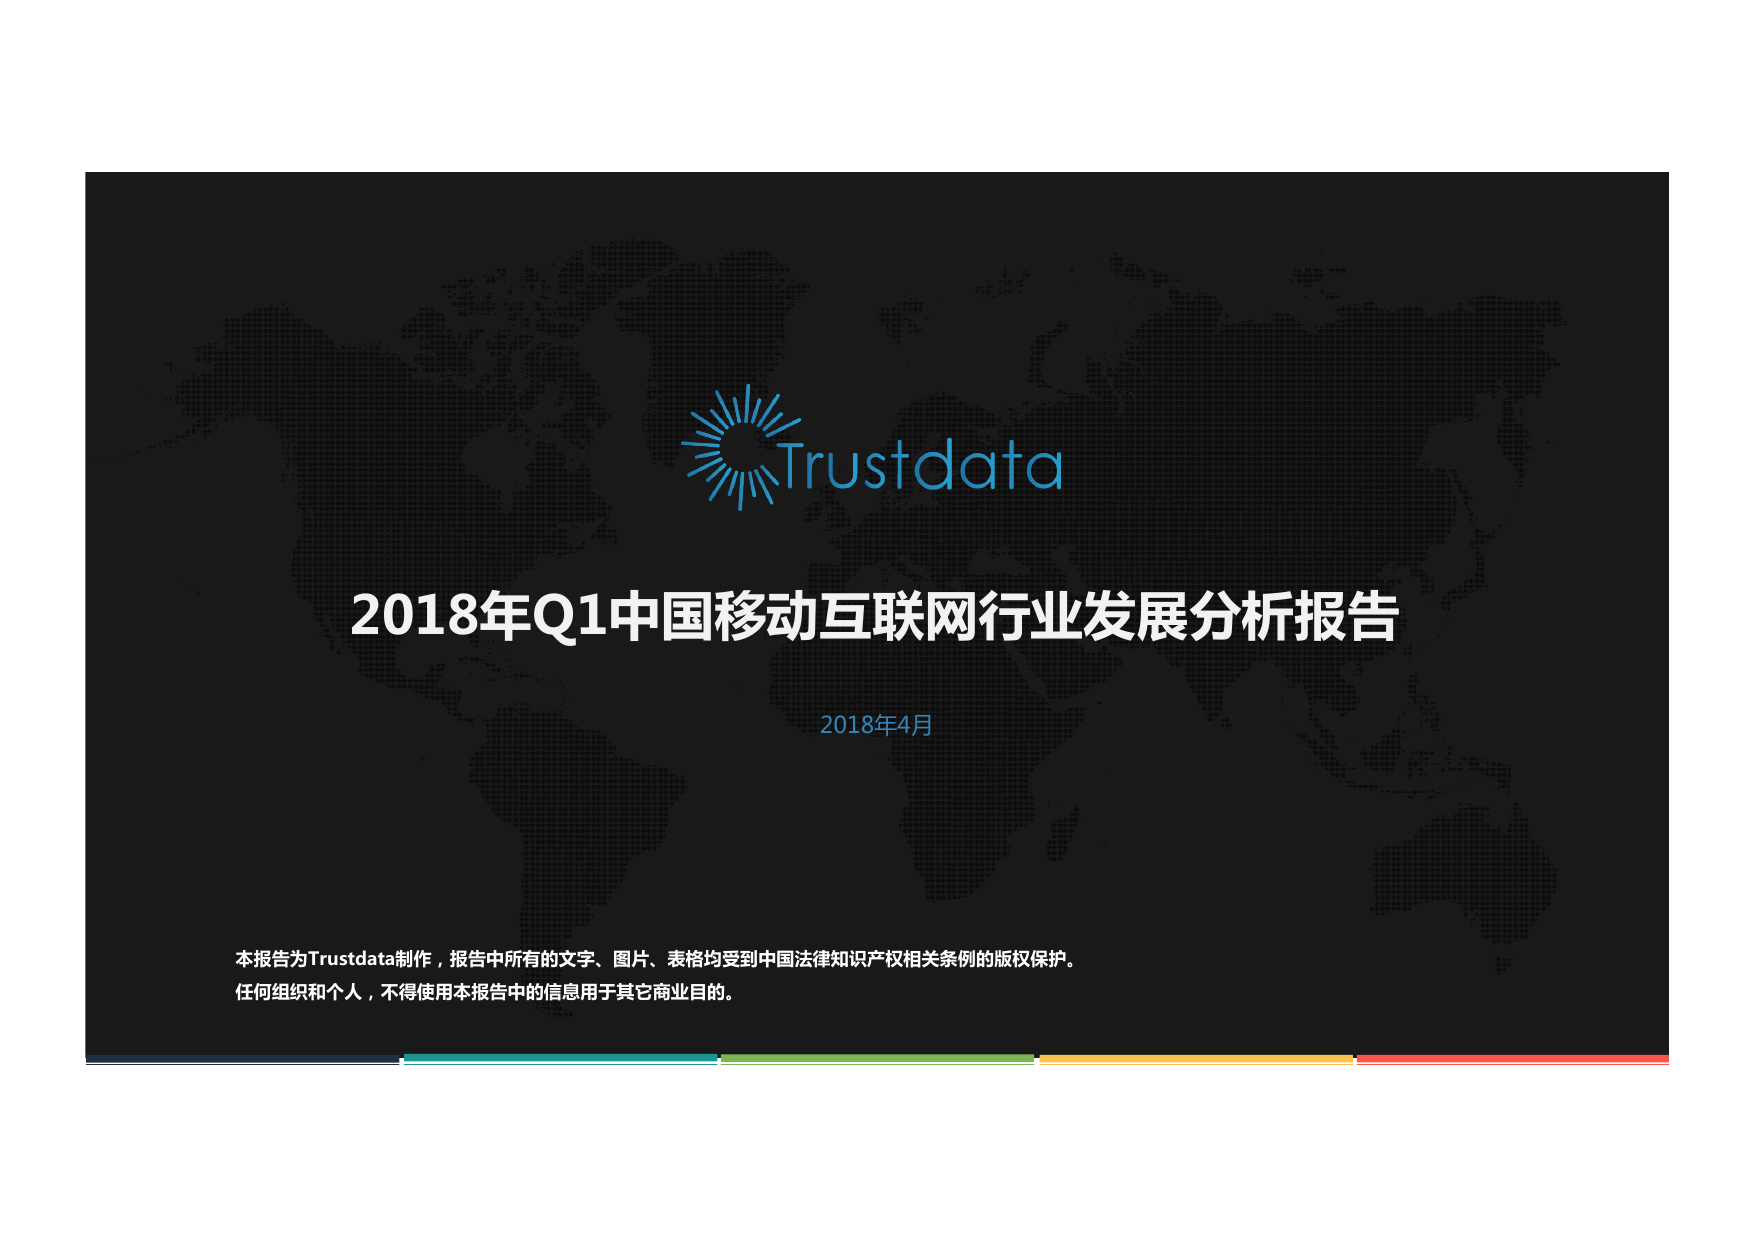 Trustdata:2018年Q1中国移动互联网行业发展分析报告(附下载)